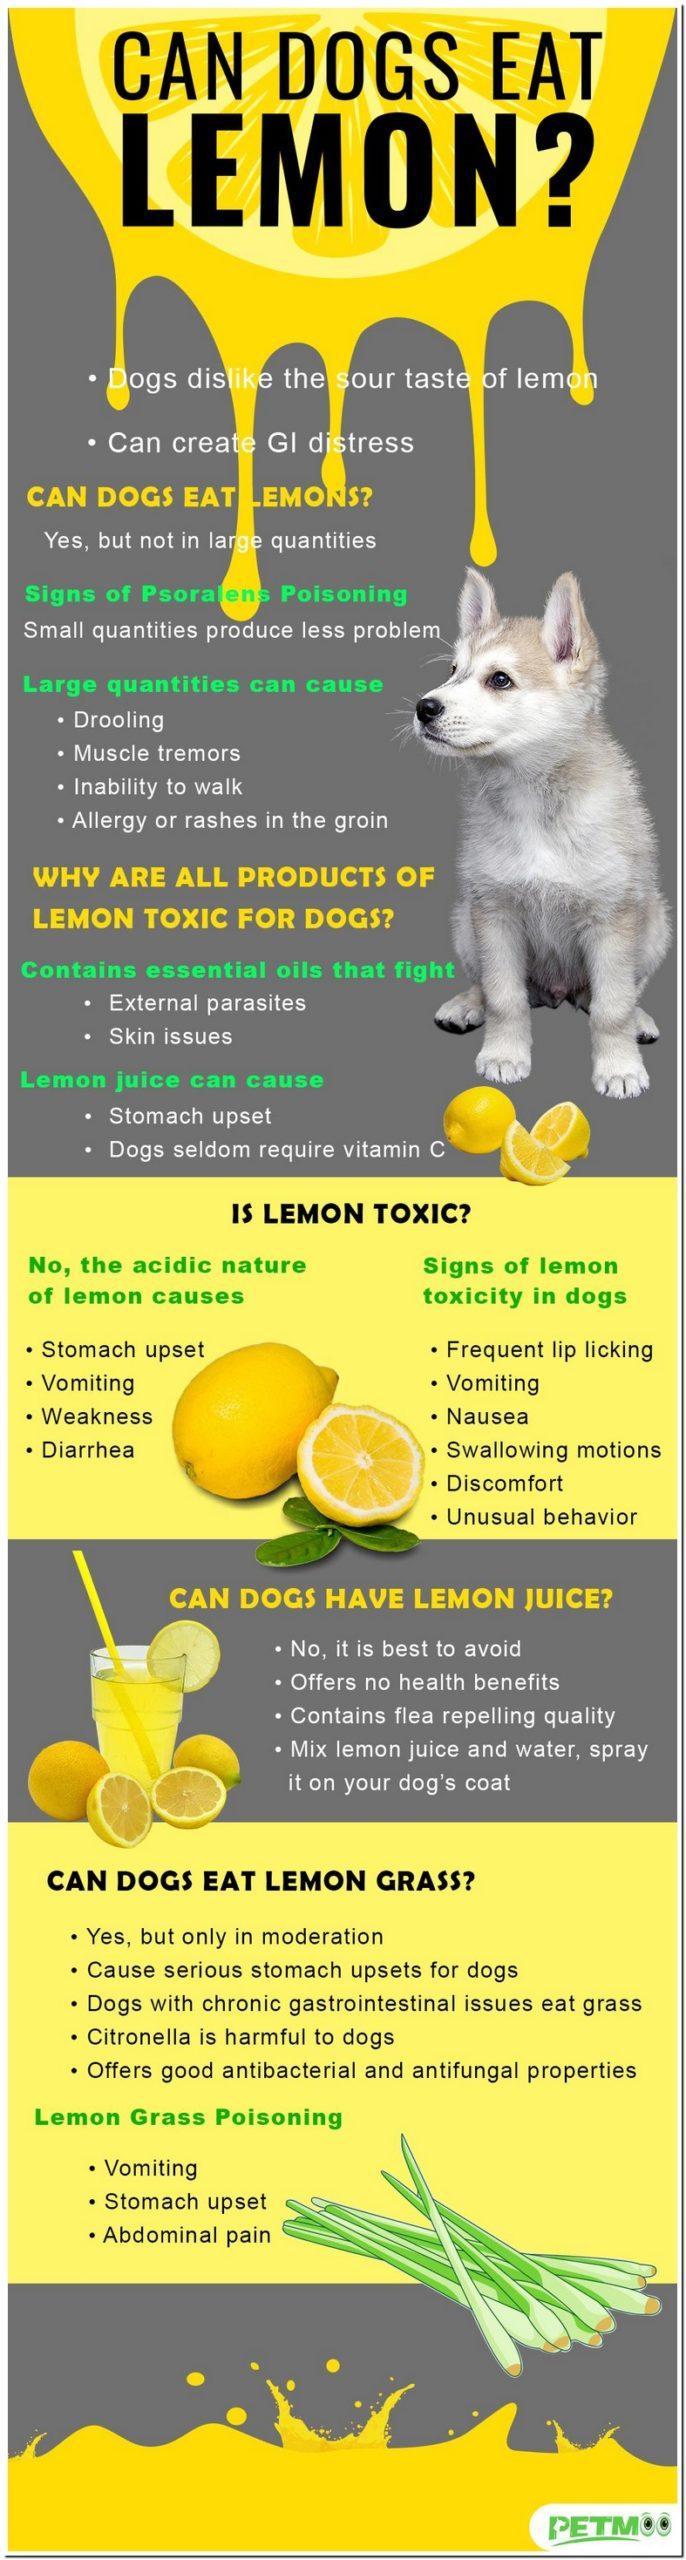 Are Lemons Safe For Dogs